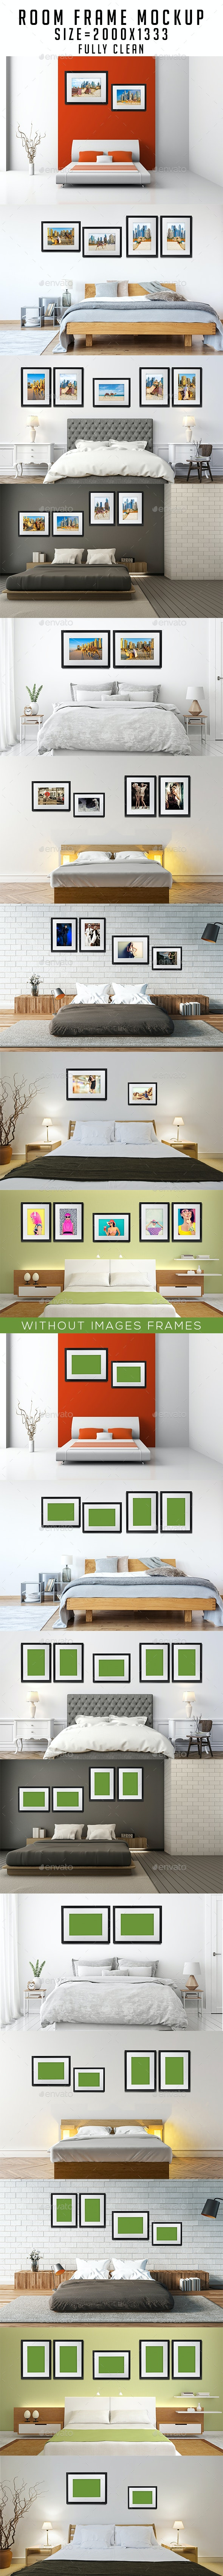 Room Frame Mockup - Print Product Mock-Ups